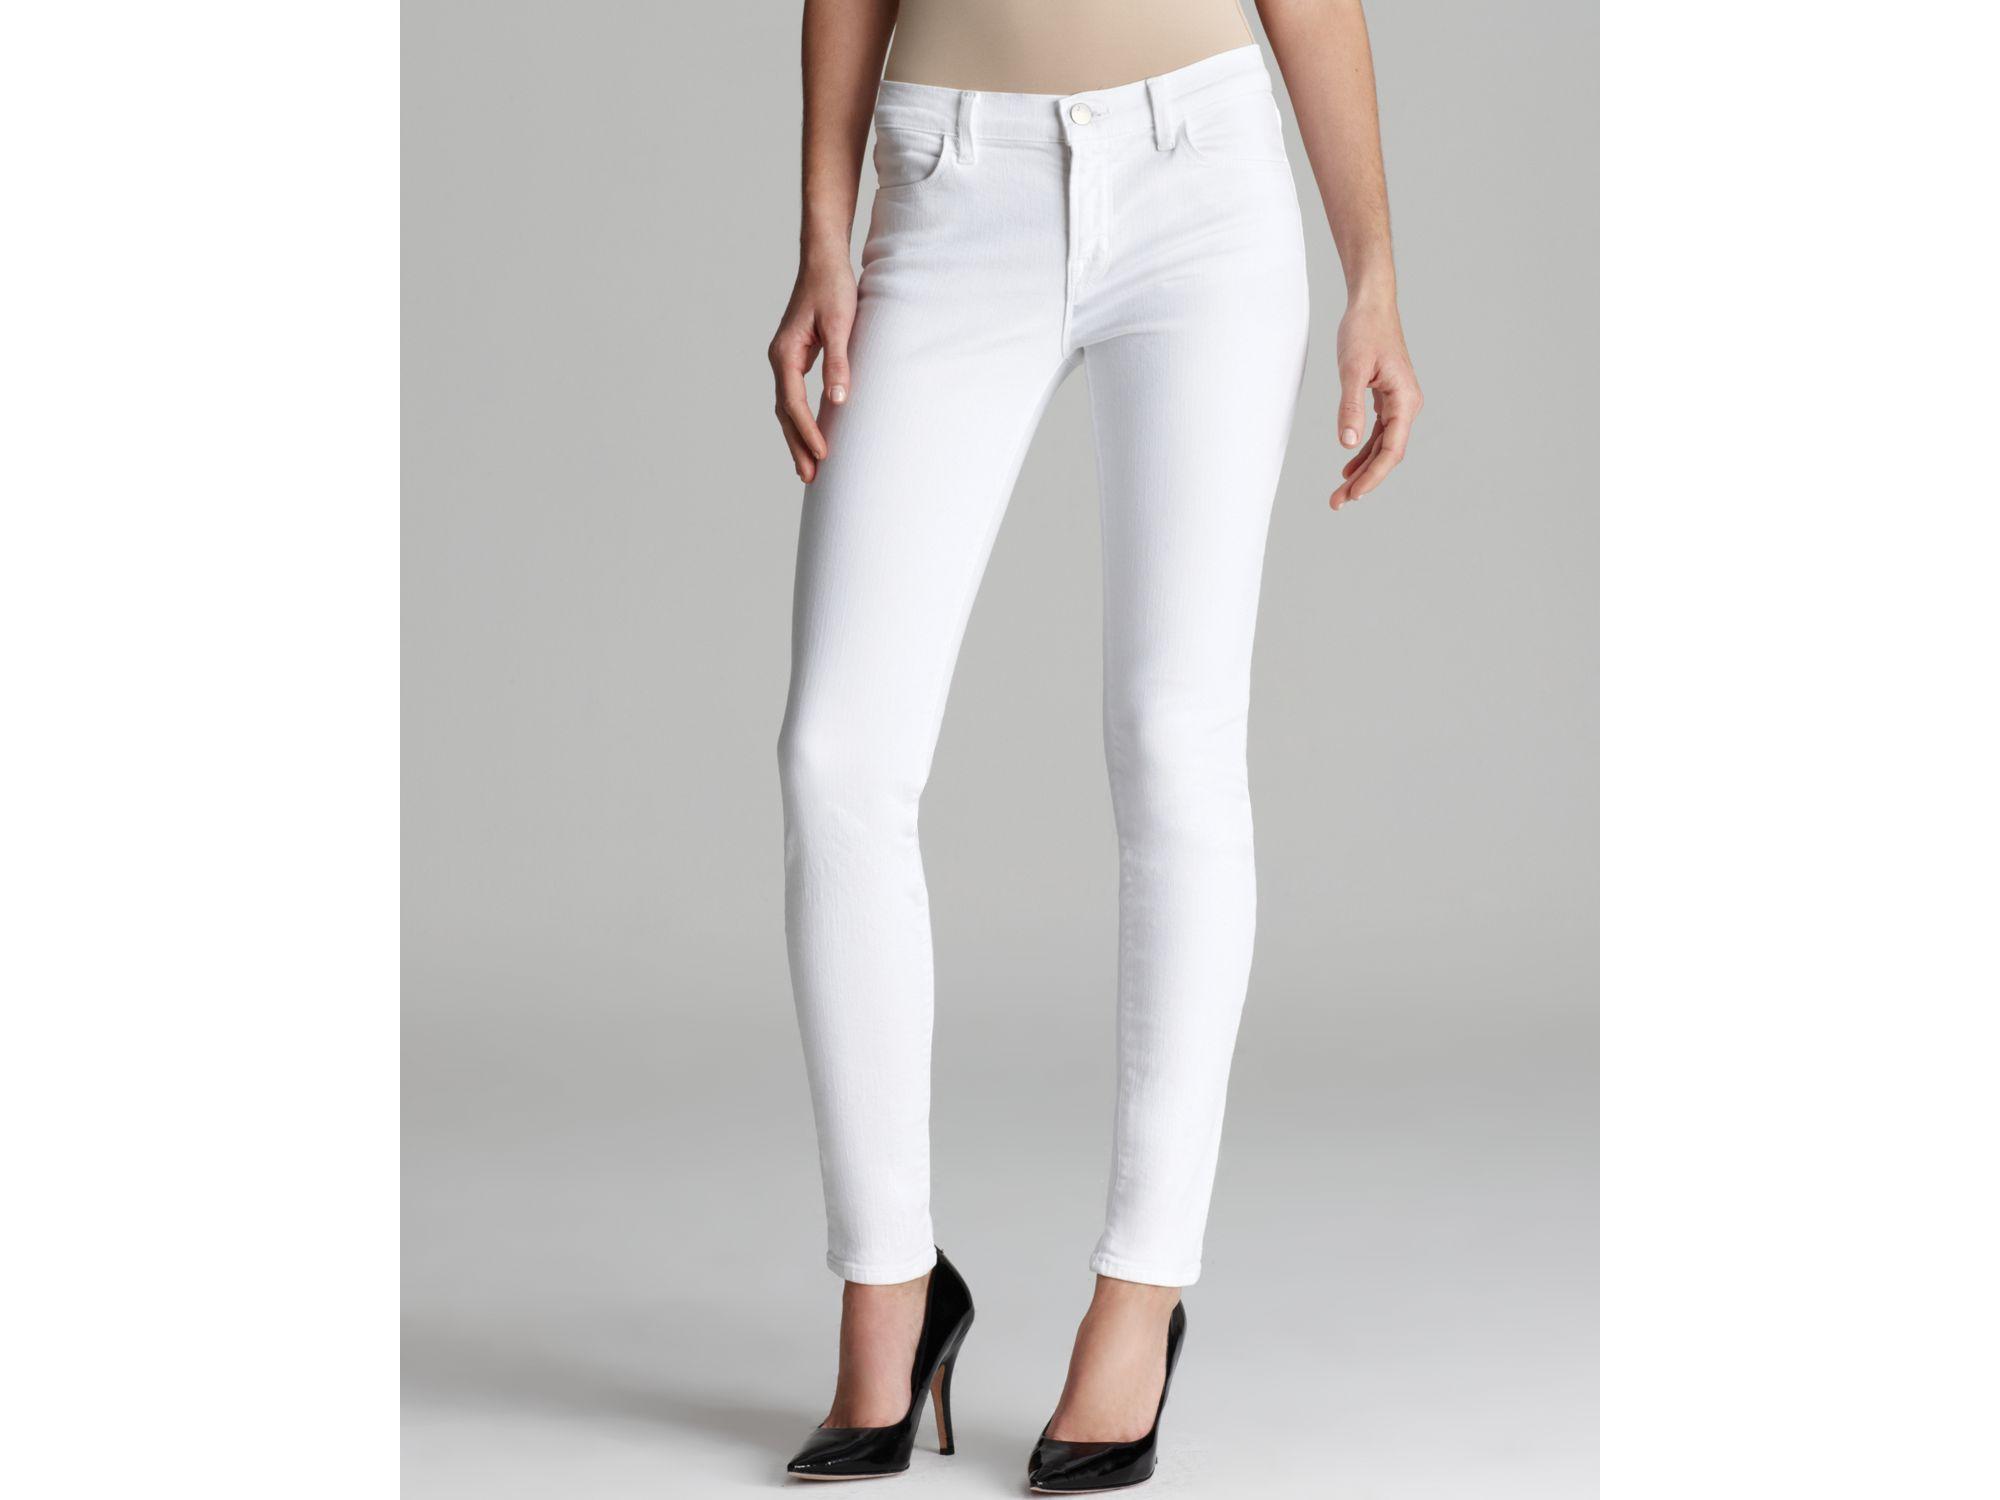 cbcec0c84d03 J Brand Jeans Mid Rise 620 Super Skinny Eyelet Leg in White in White ...